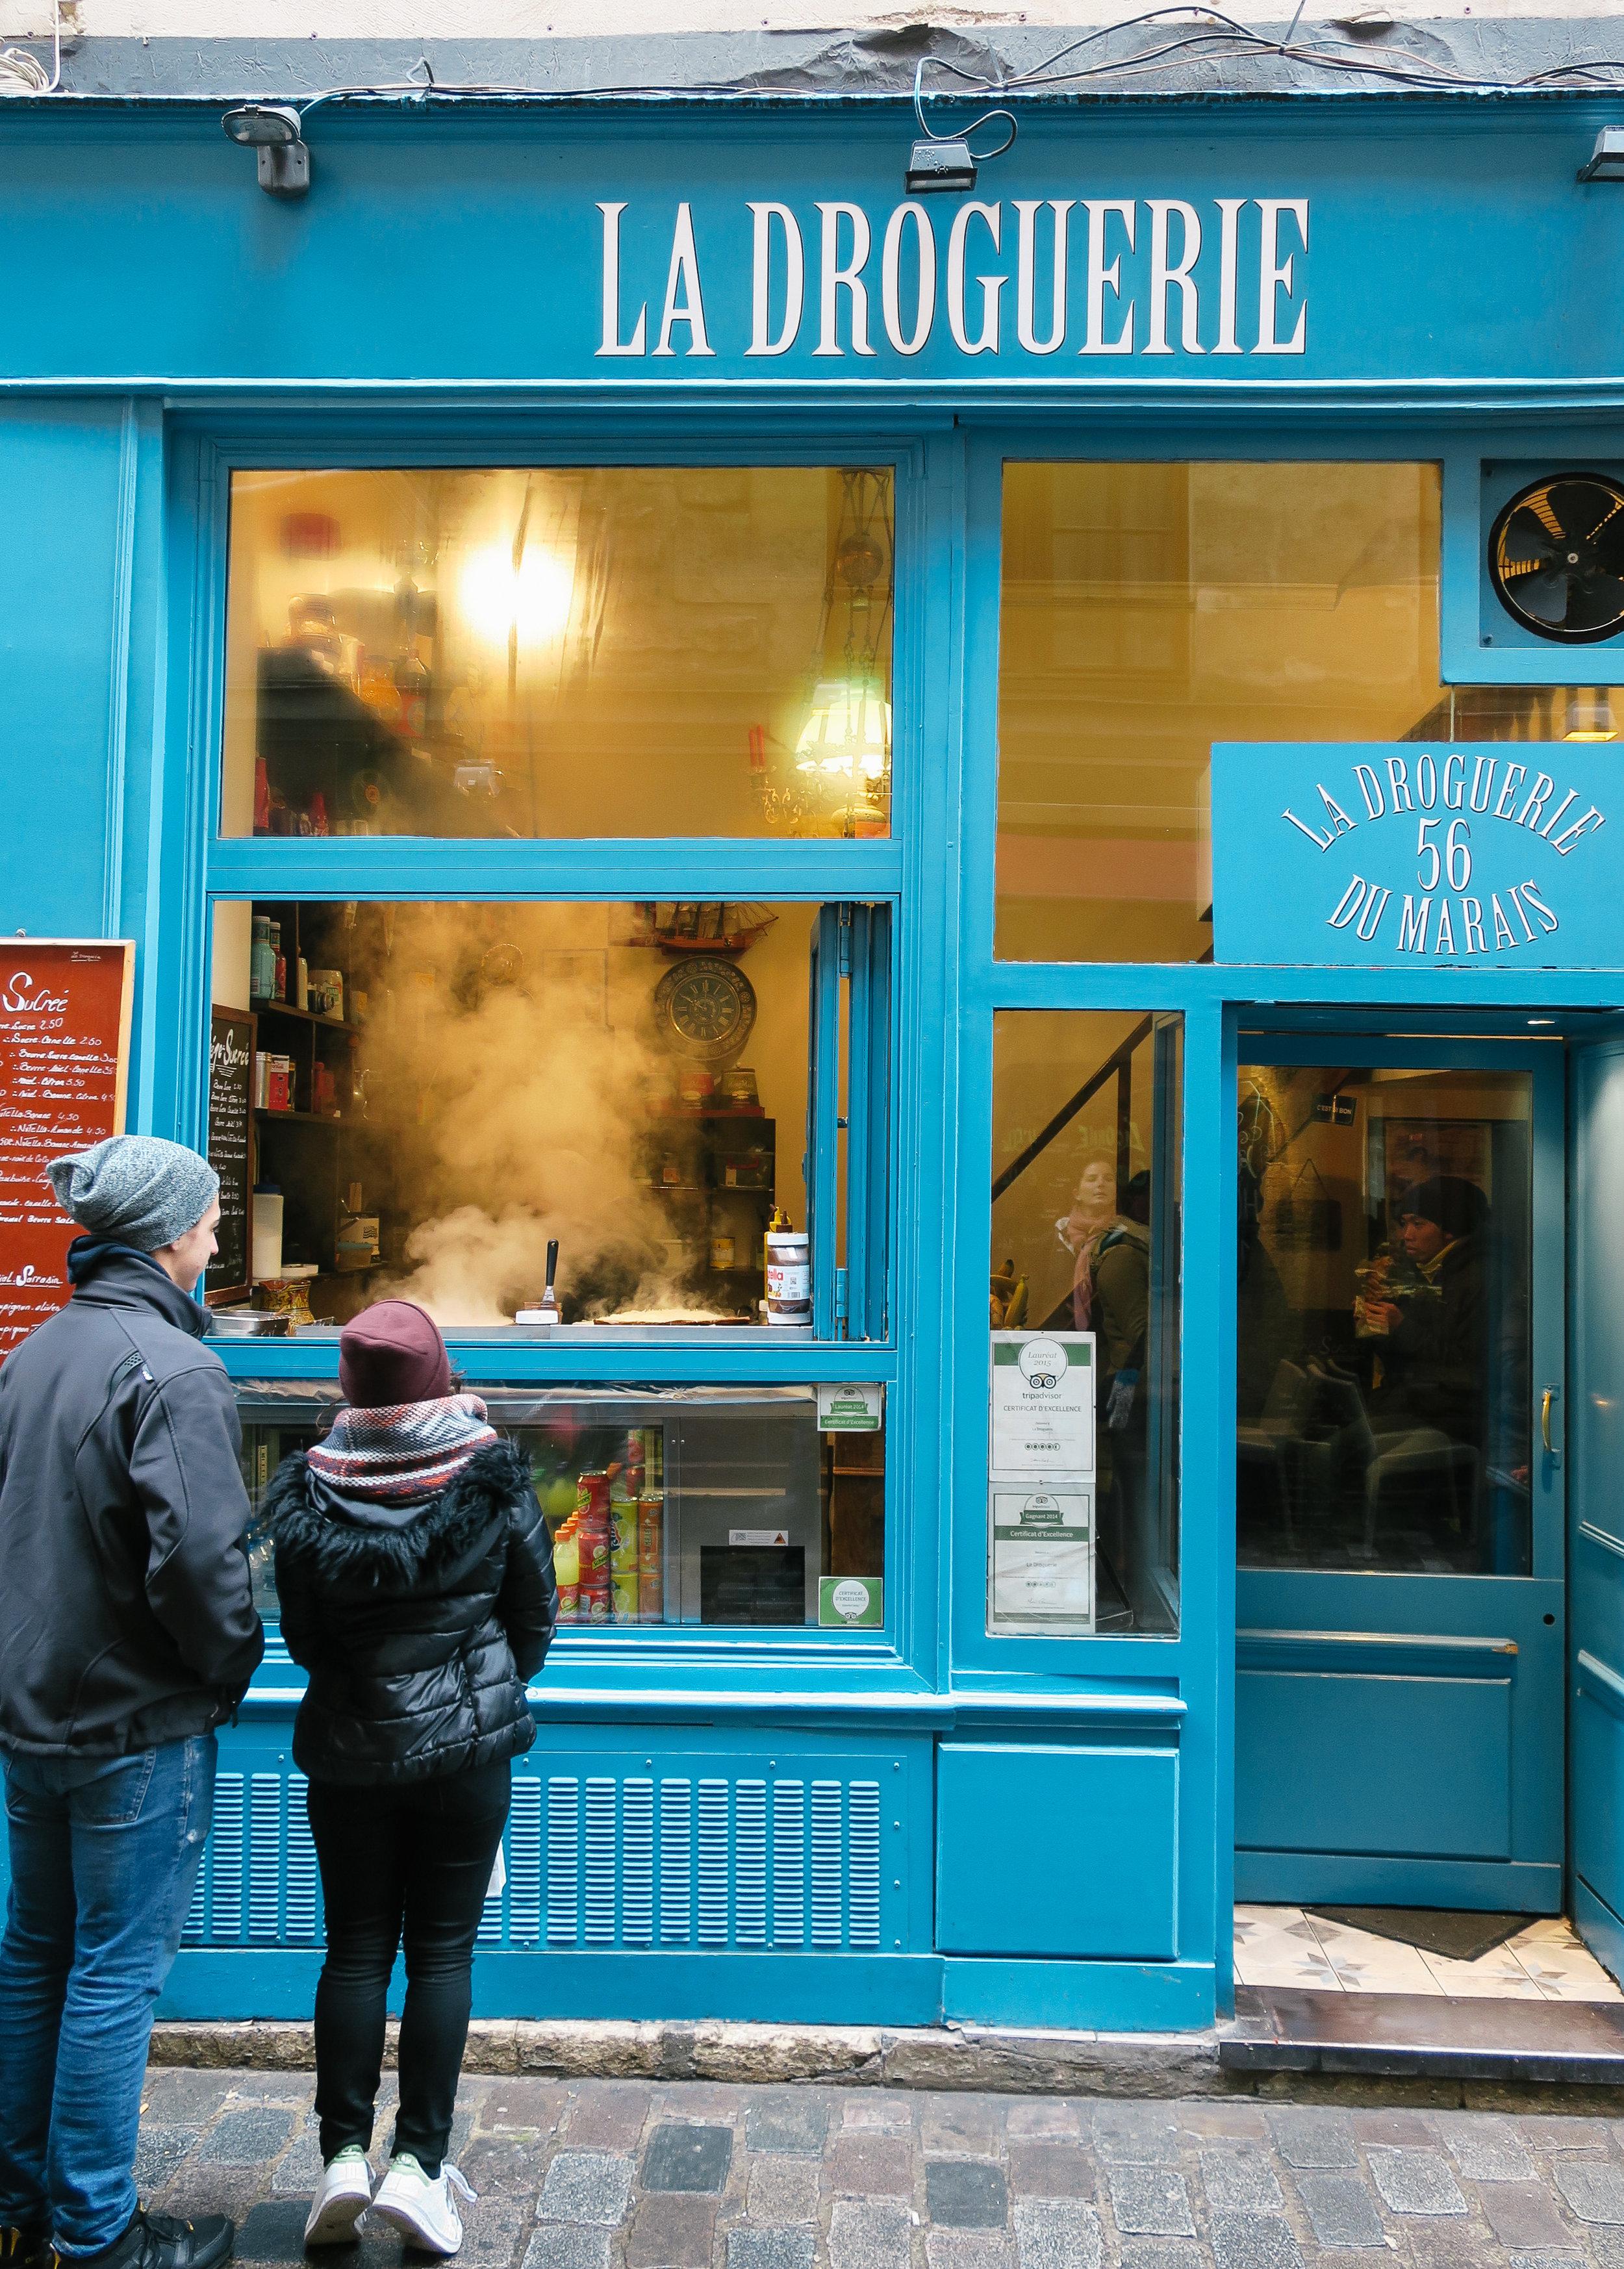 paris-france-travel-guide-lifeonpine_IMG_0339.jpg